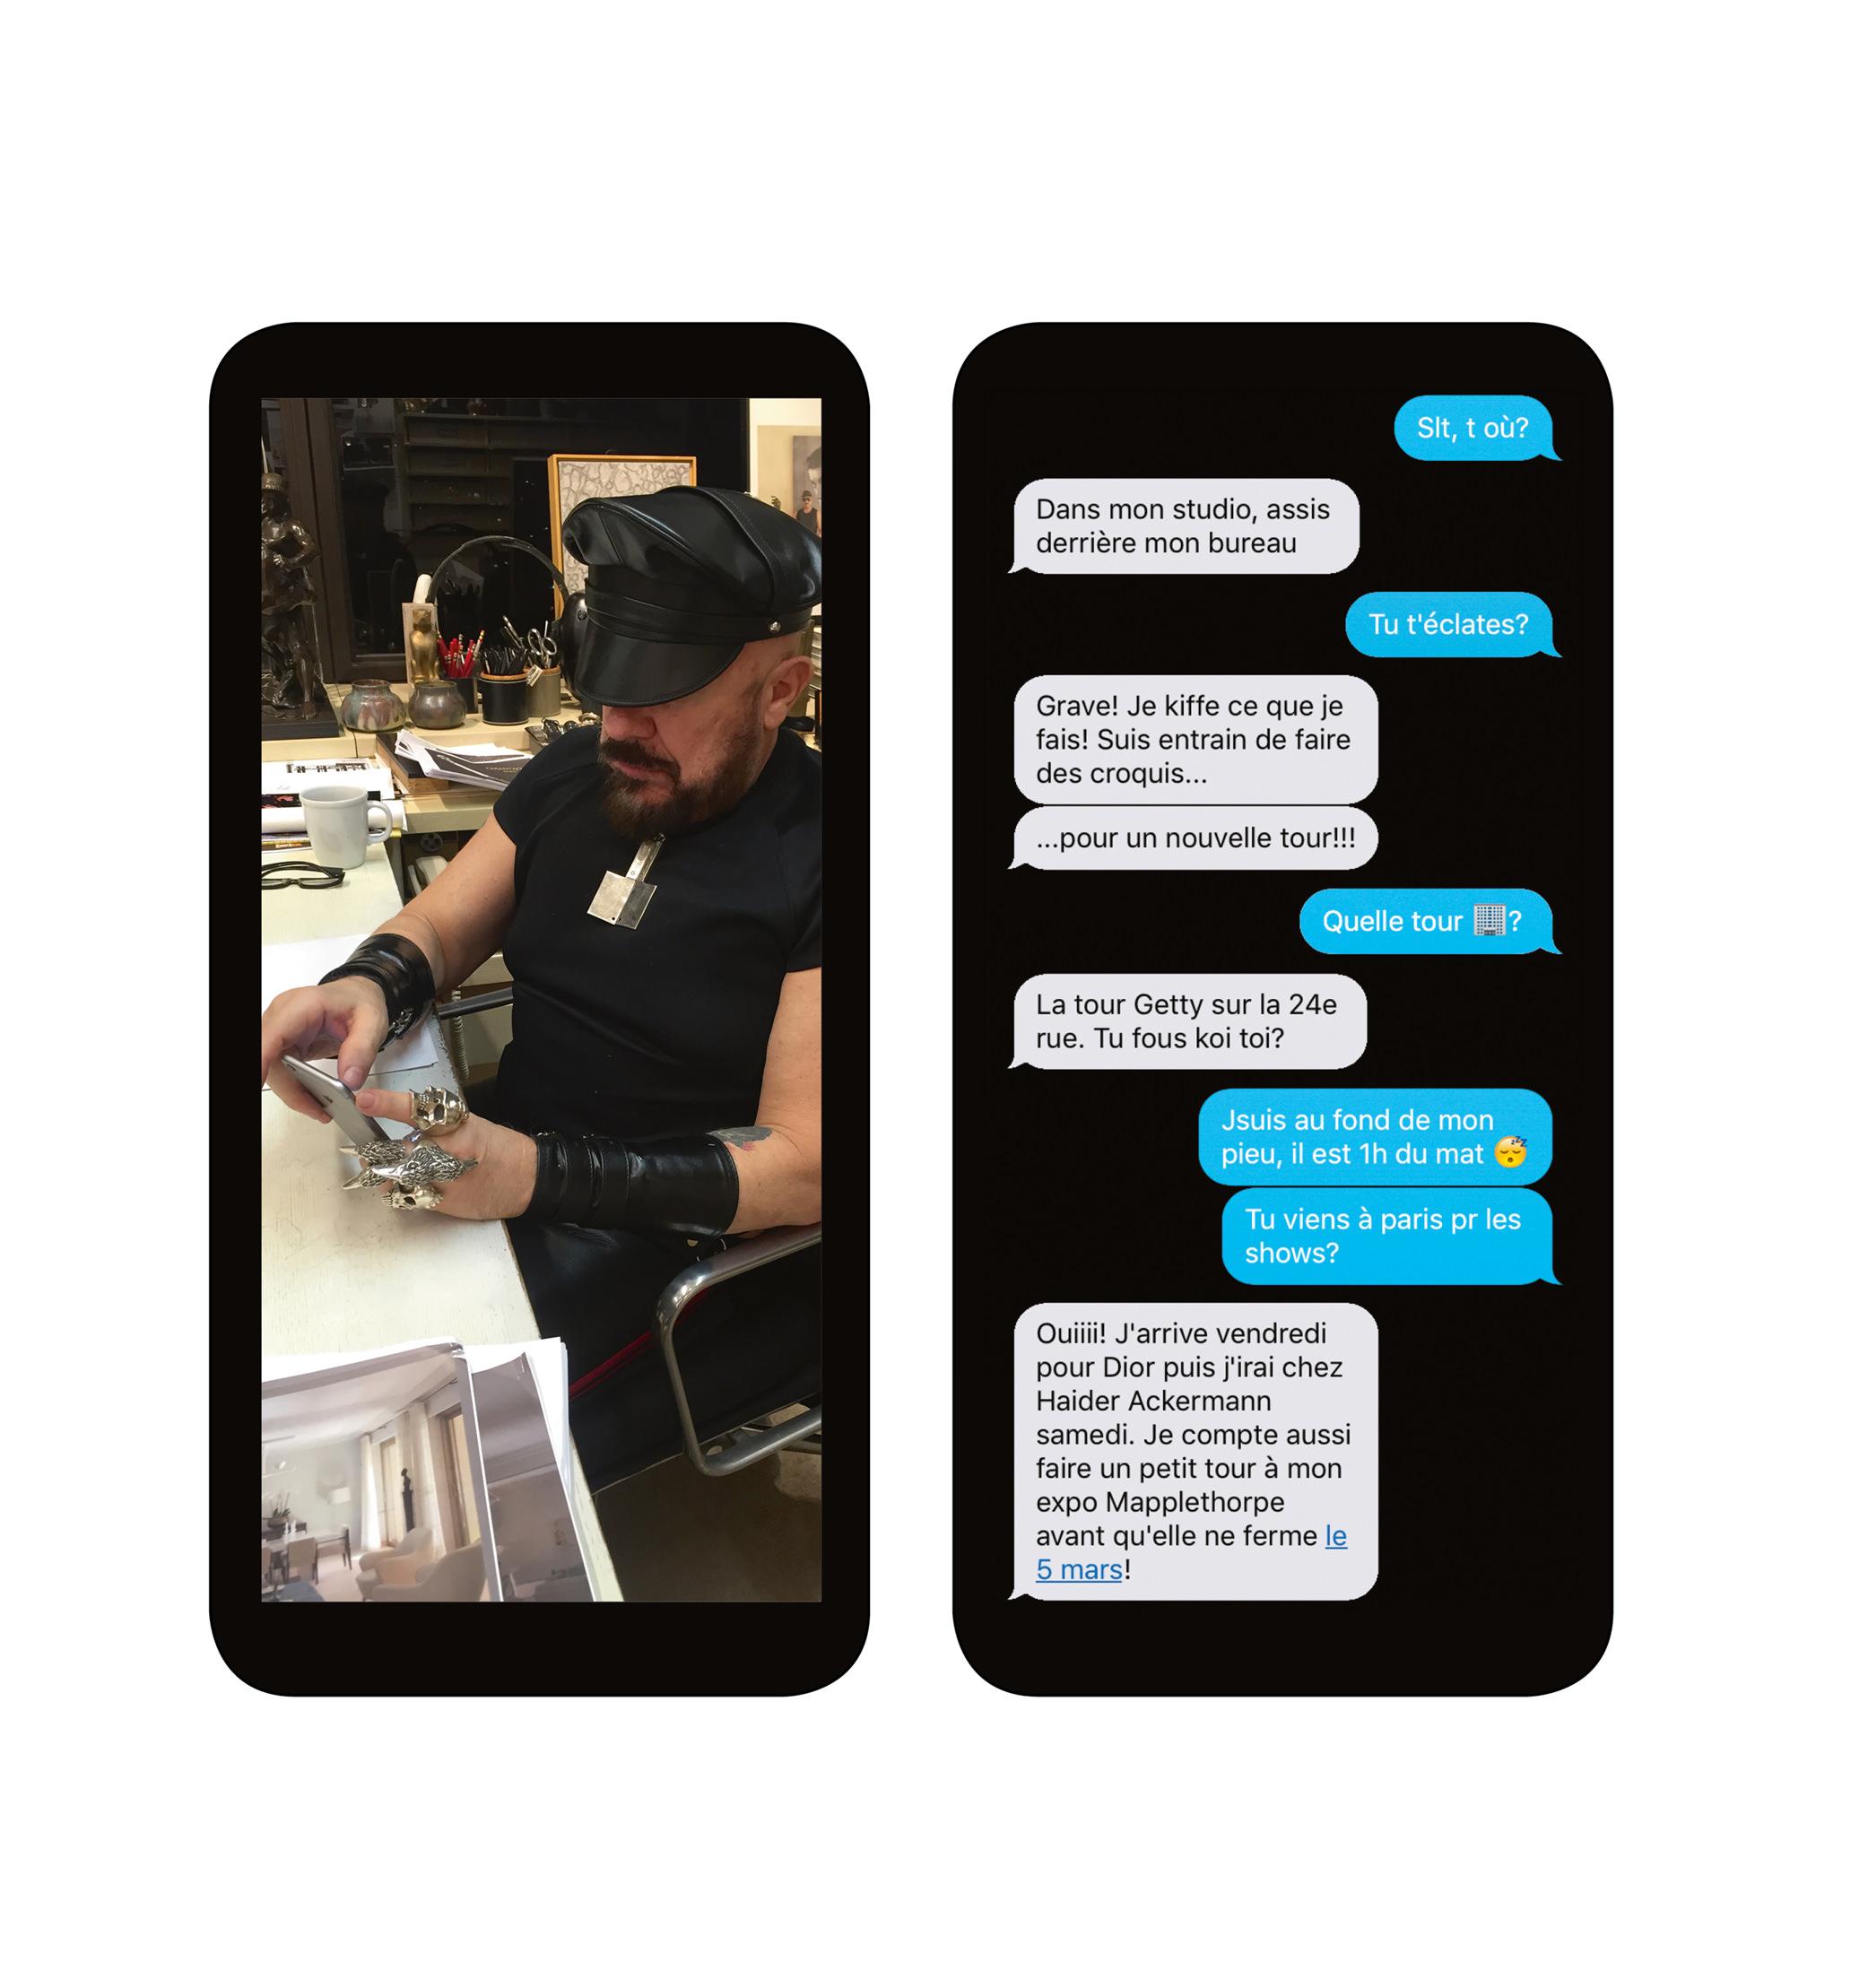 Numéro masqué: SMS hautement confidentiels avec Peter Marino